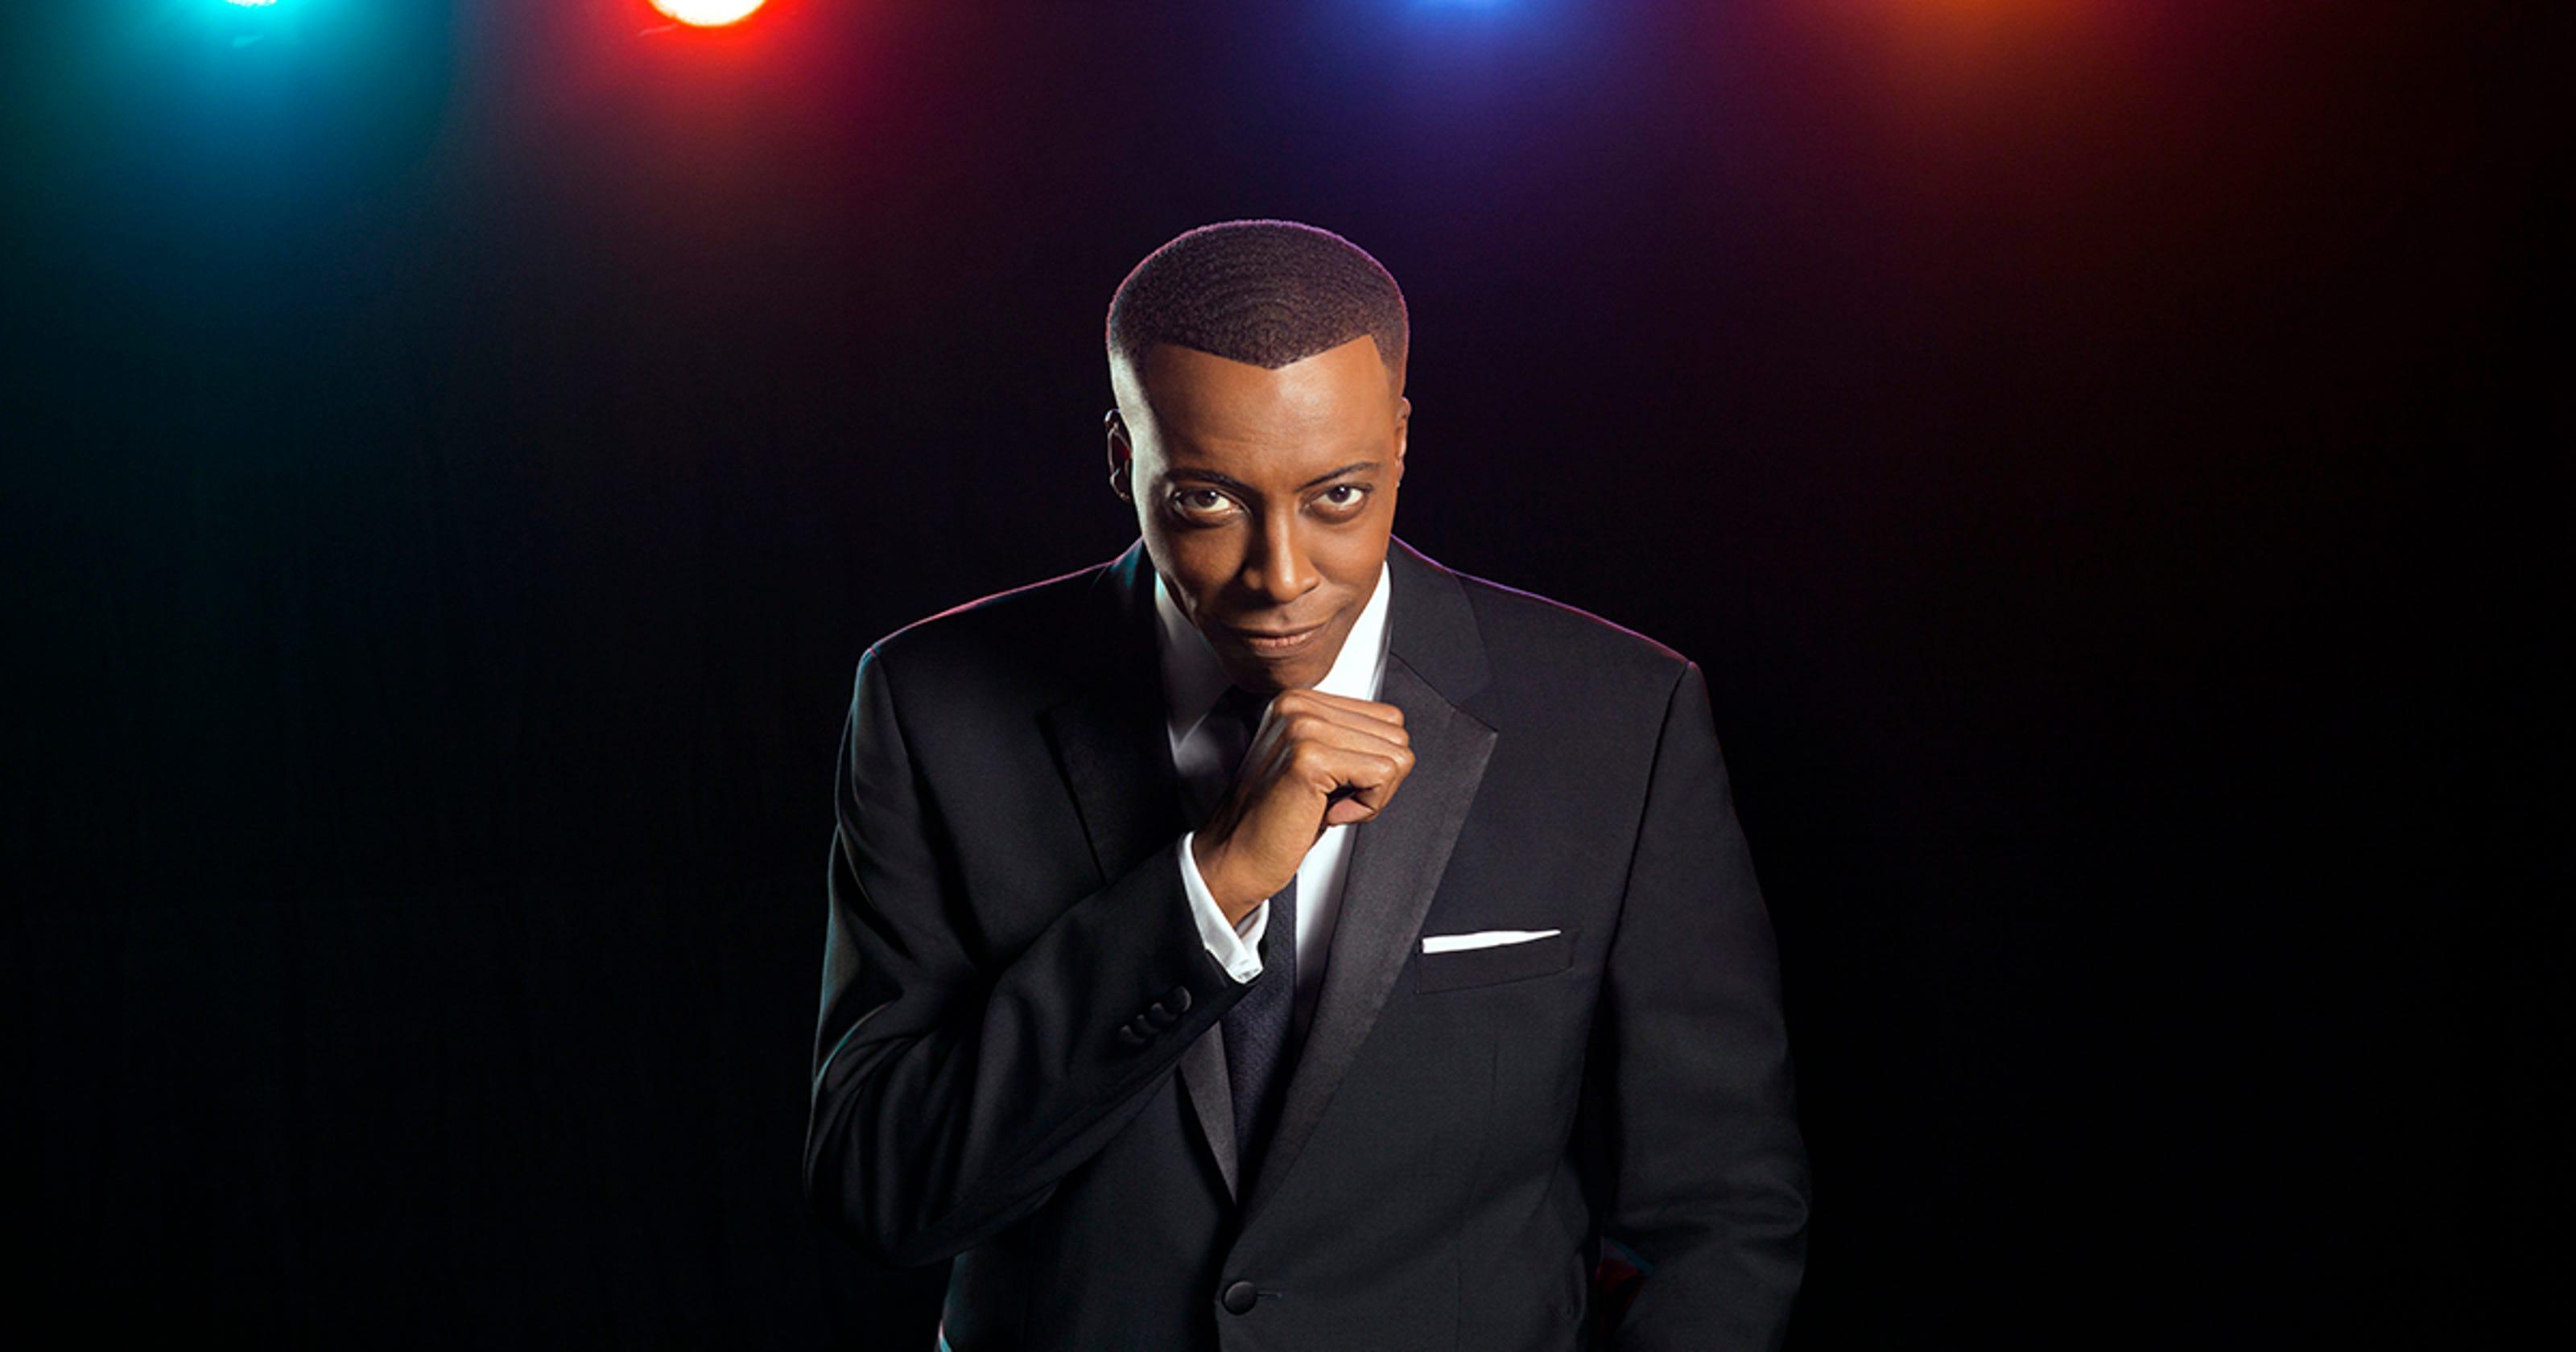 aa0377699c Comedian Arsenio Hall will host Junior Bridgeman's Trifecta 2018 Kentucky  Derby Gala